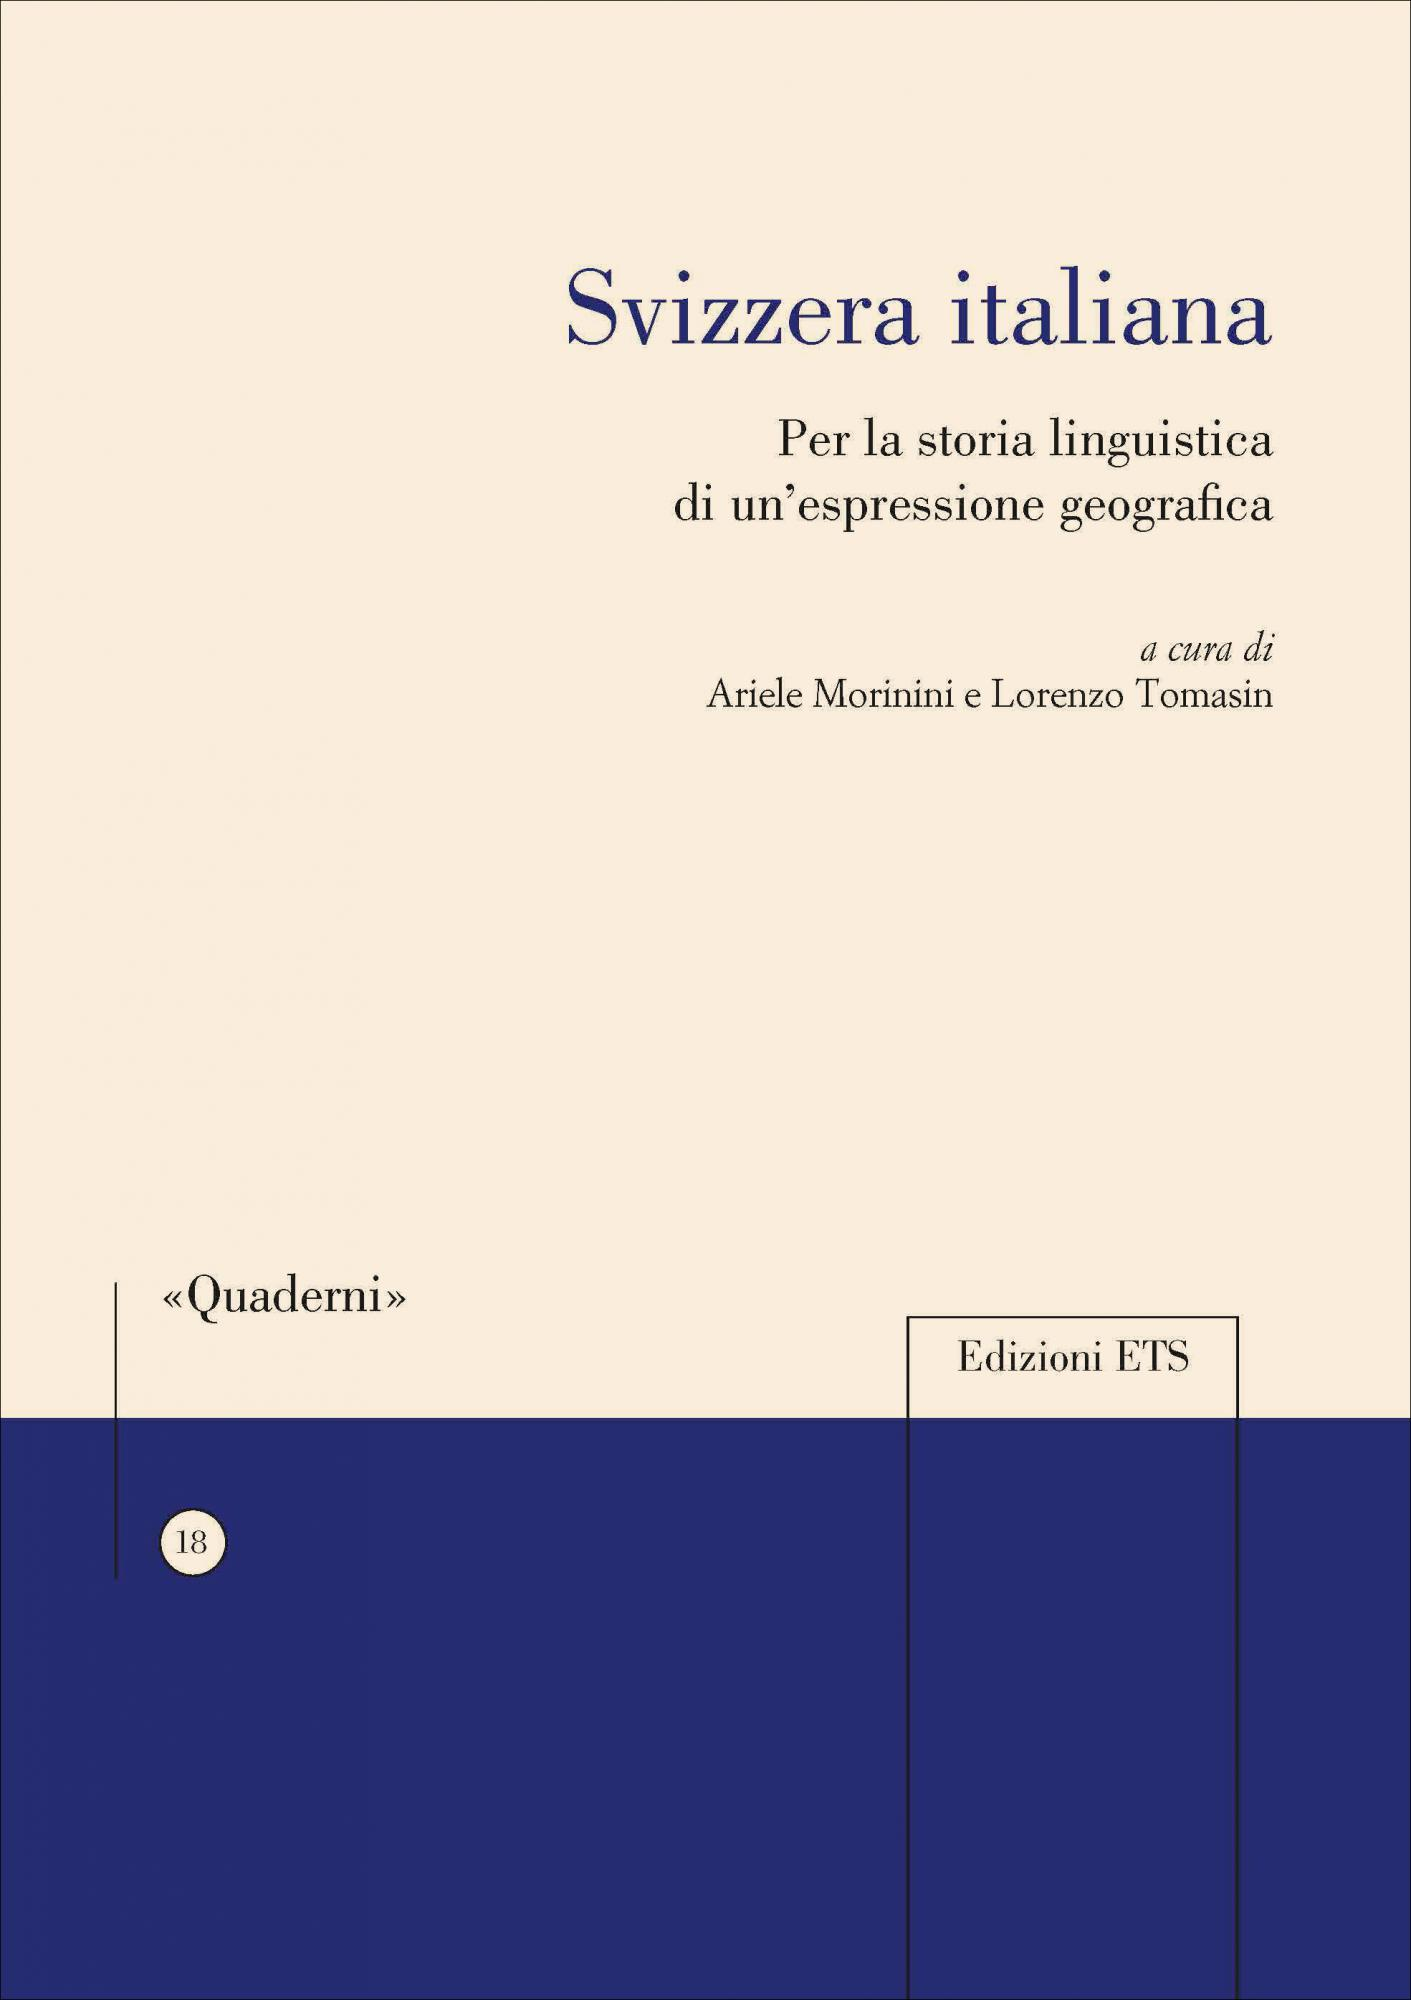 Svizzera italiana-<em>novità in arrivo</em>.Per la storia linguistica di un'espressione geografica